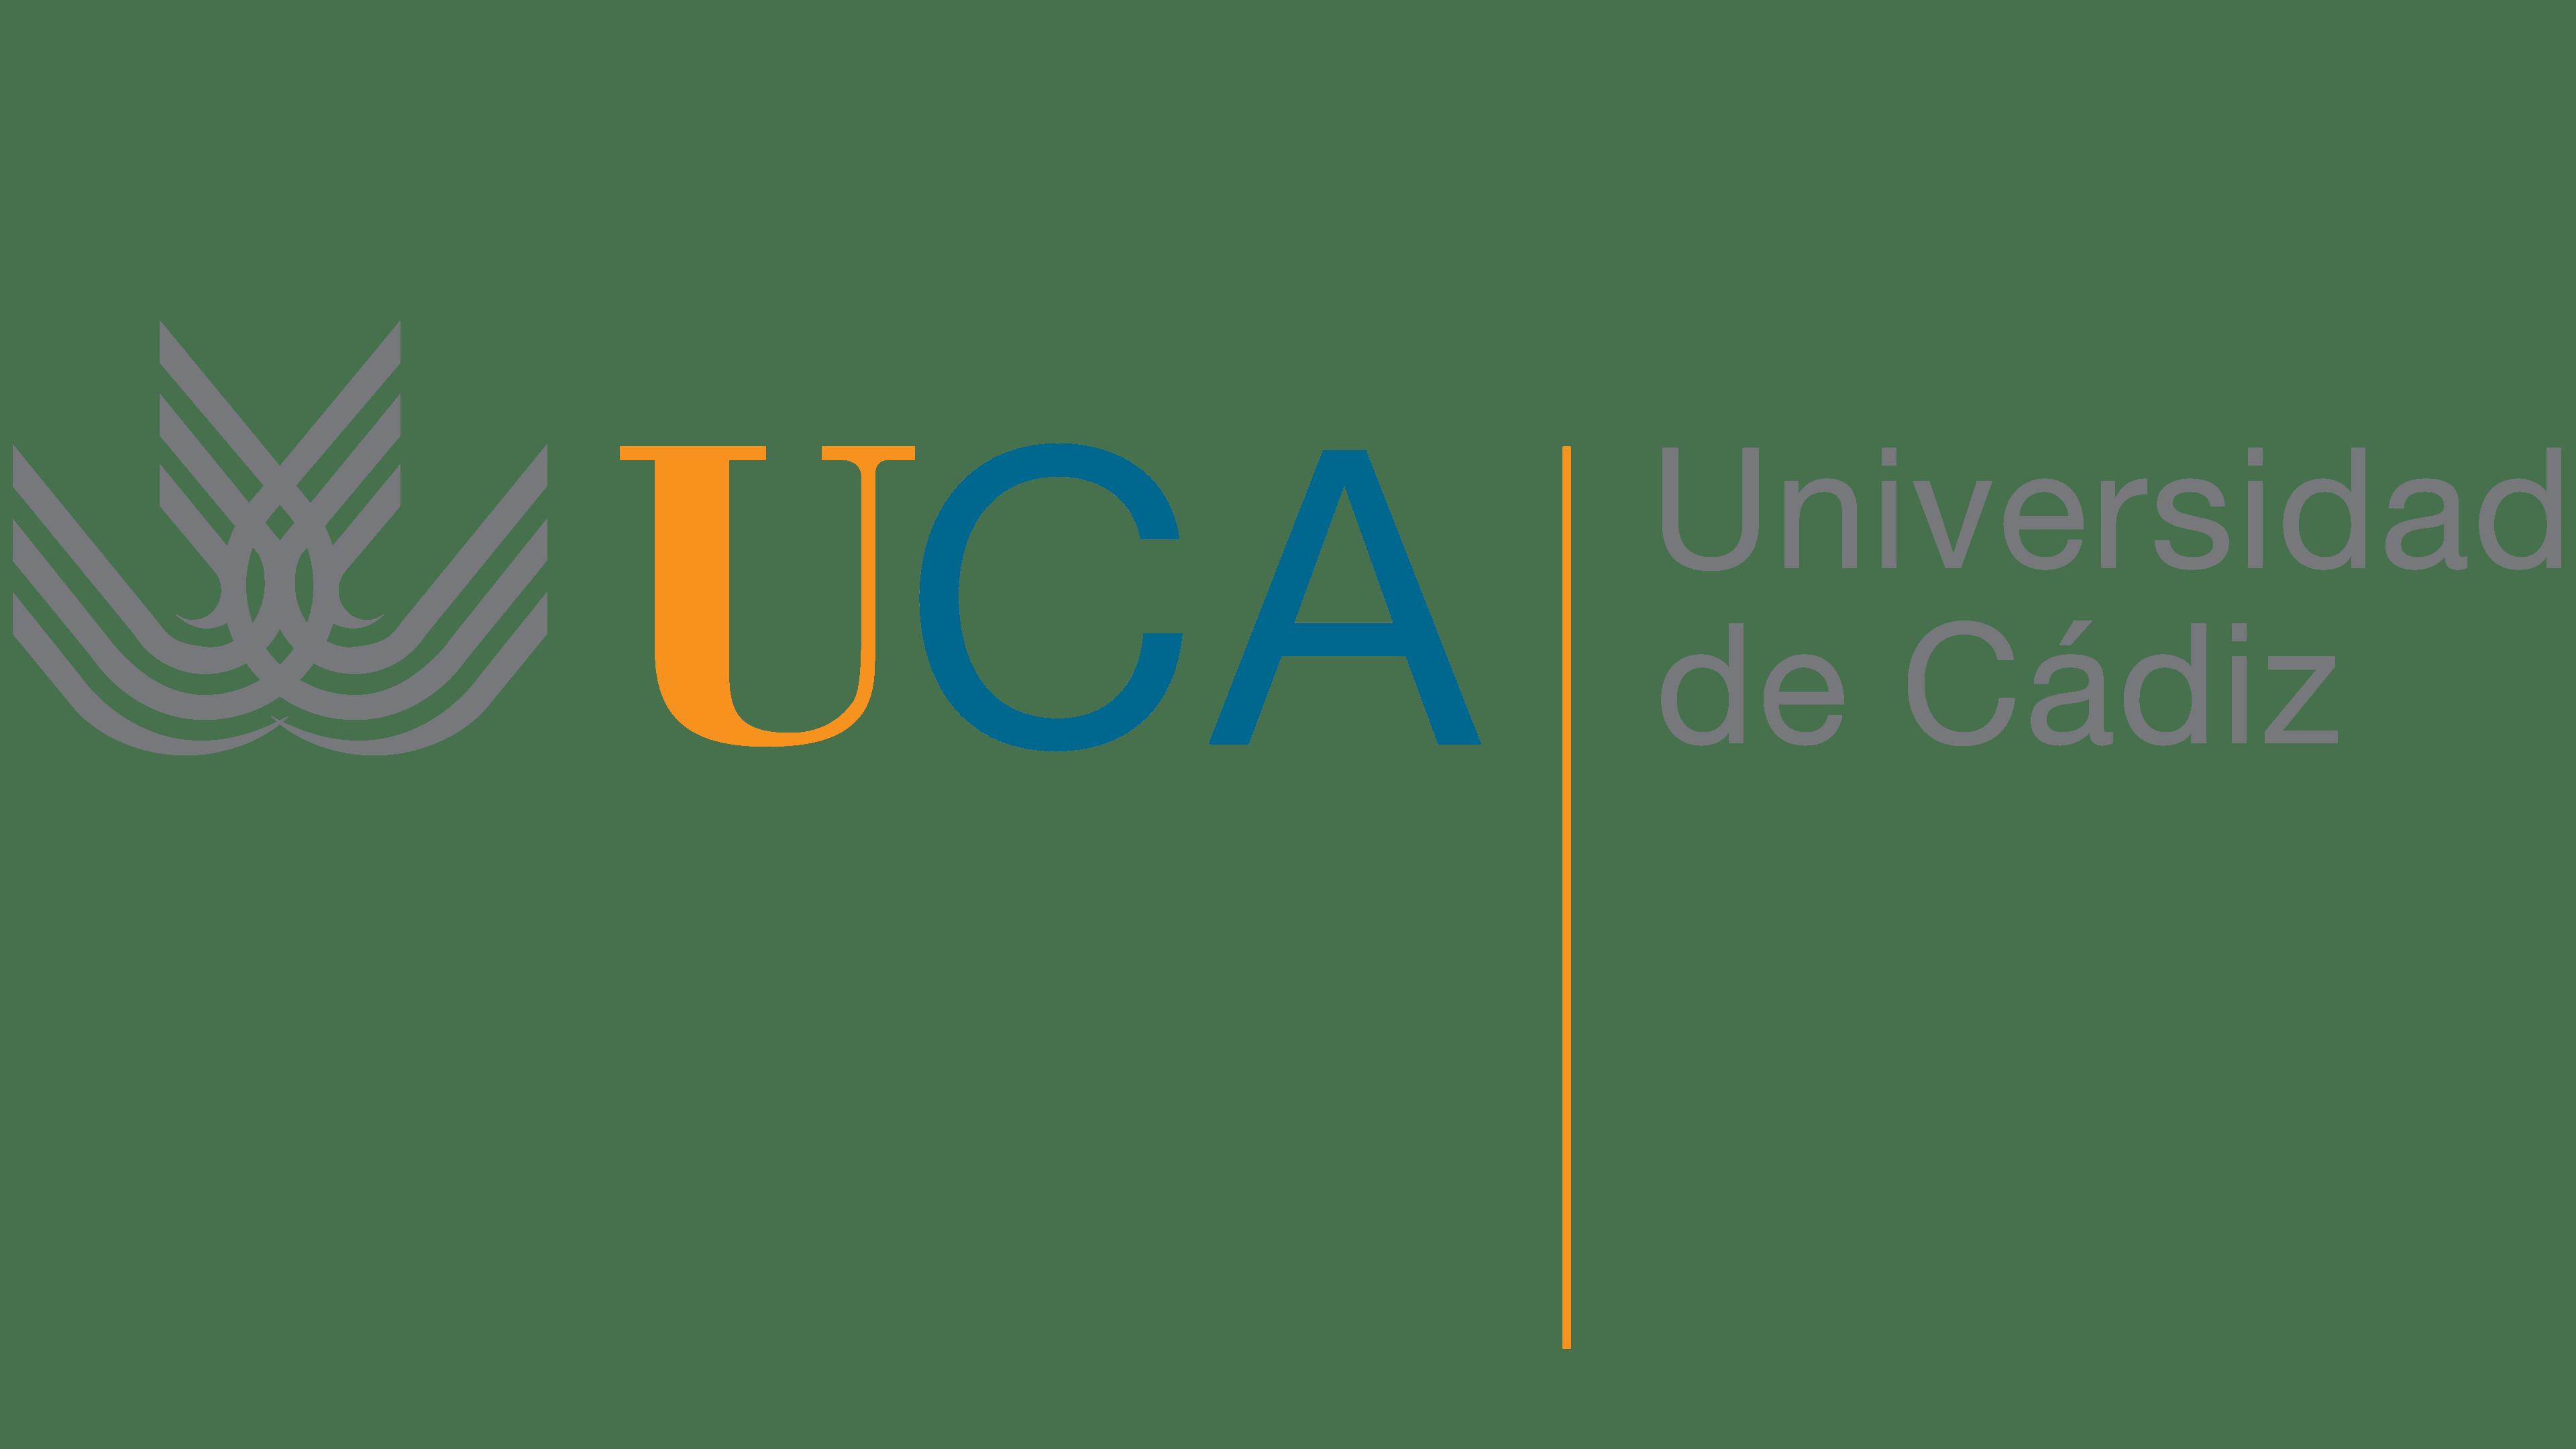 University of Cadiz (ES)